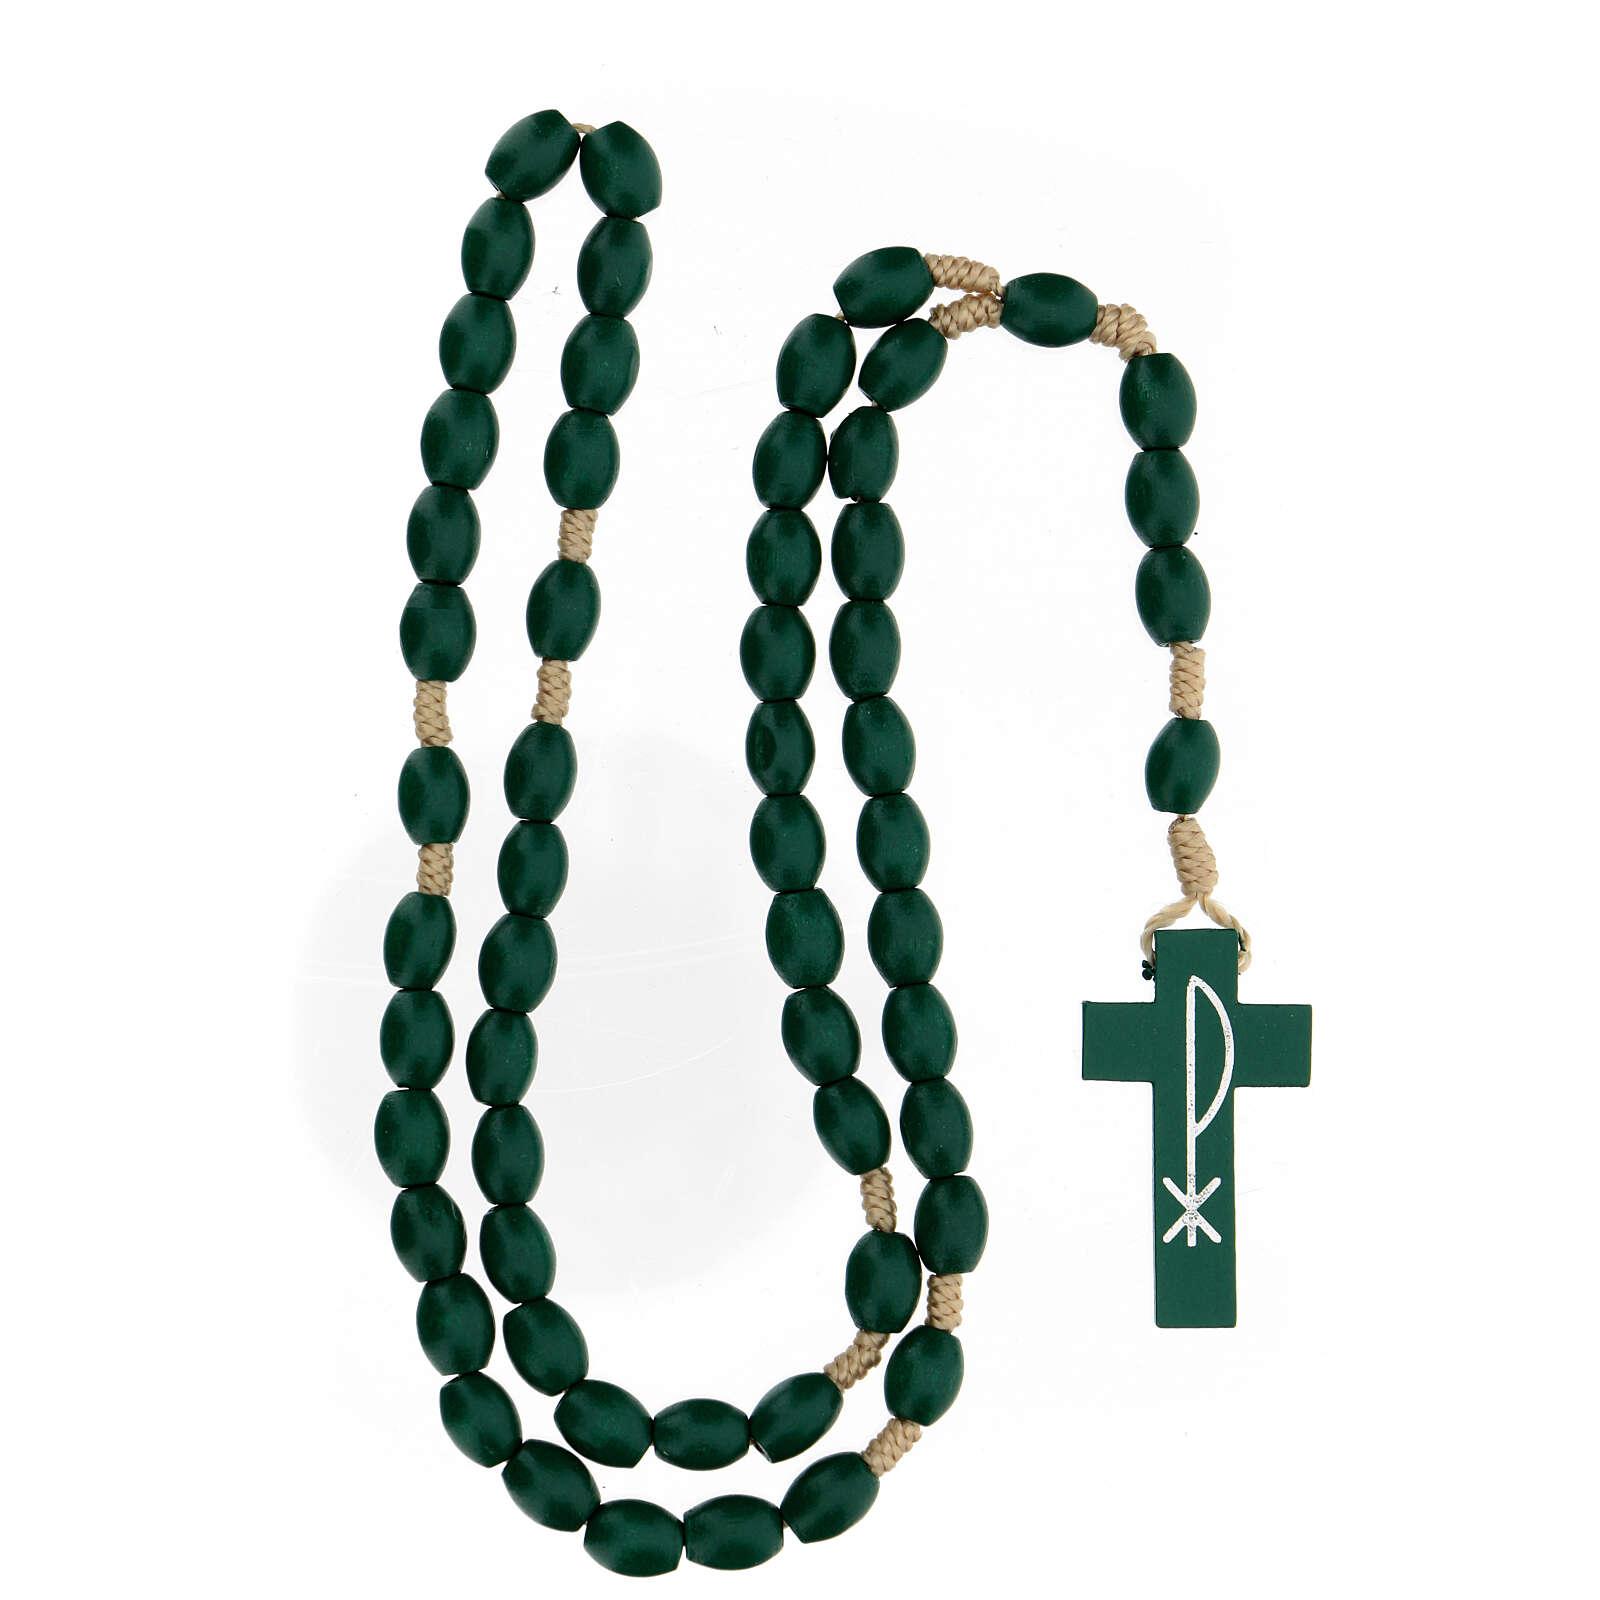 Green wood Medjugorje rosary 4